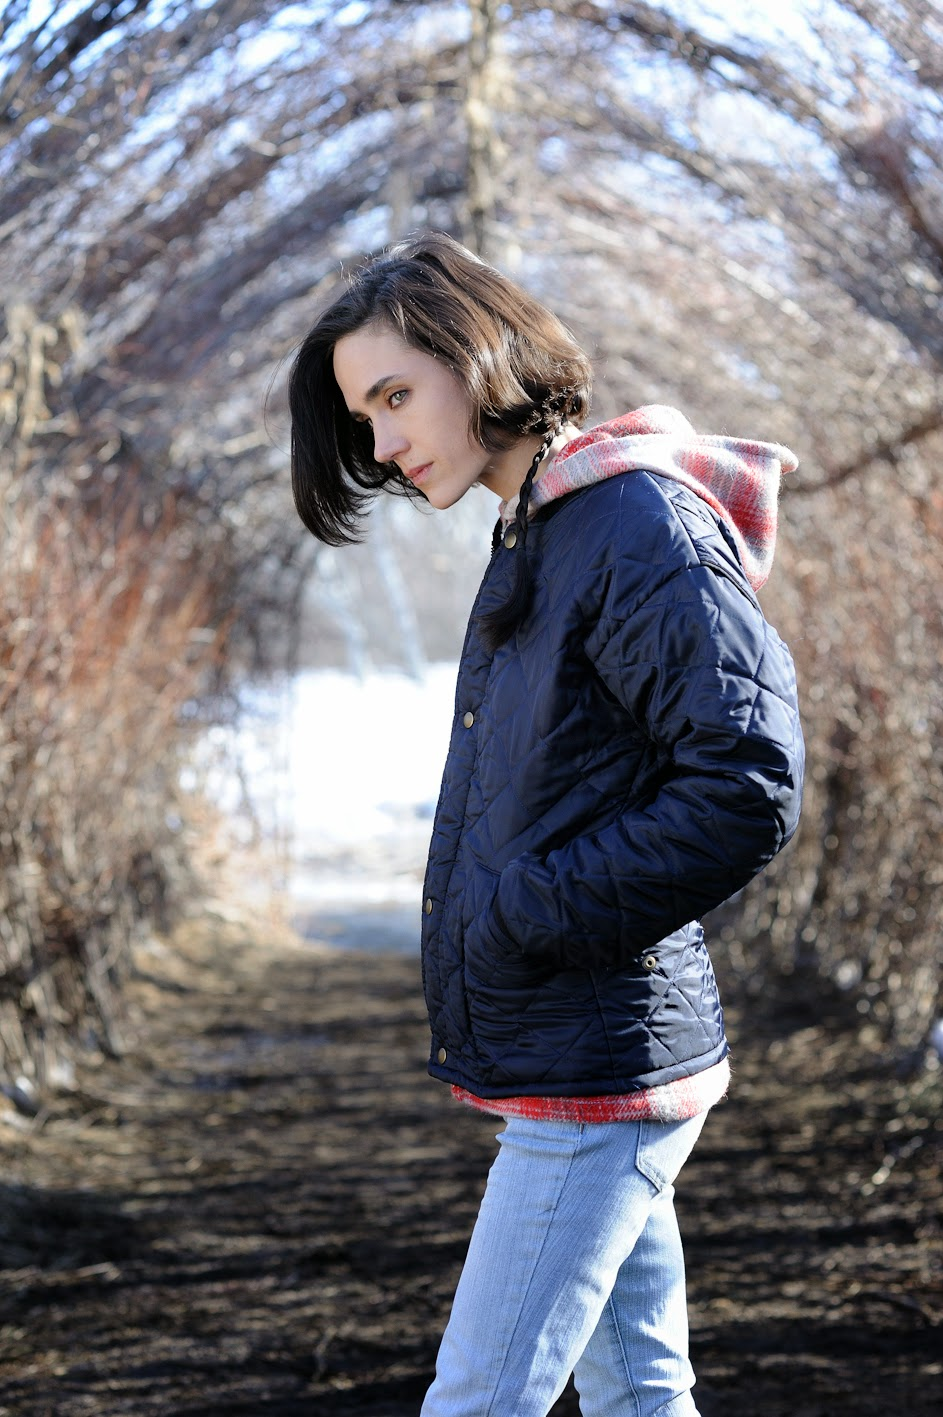 Jennifer Connelly in Aloft